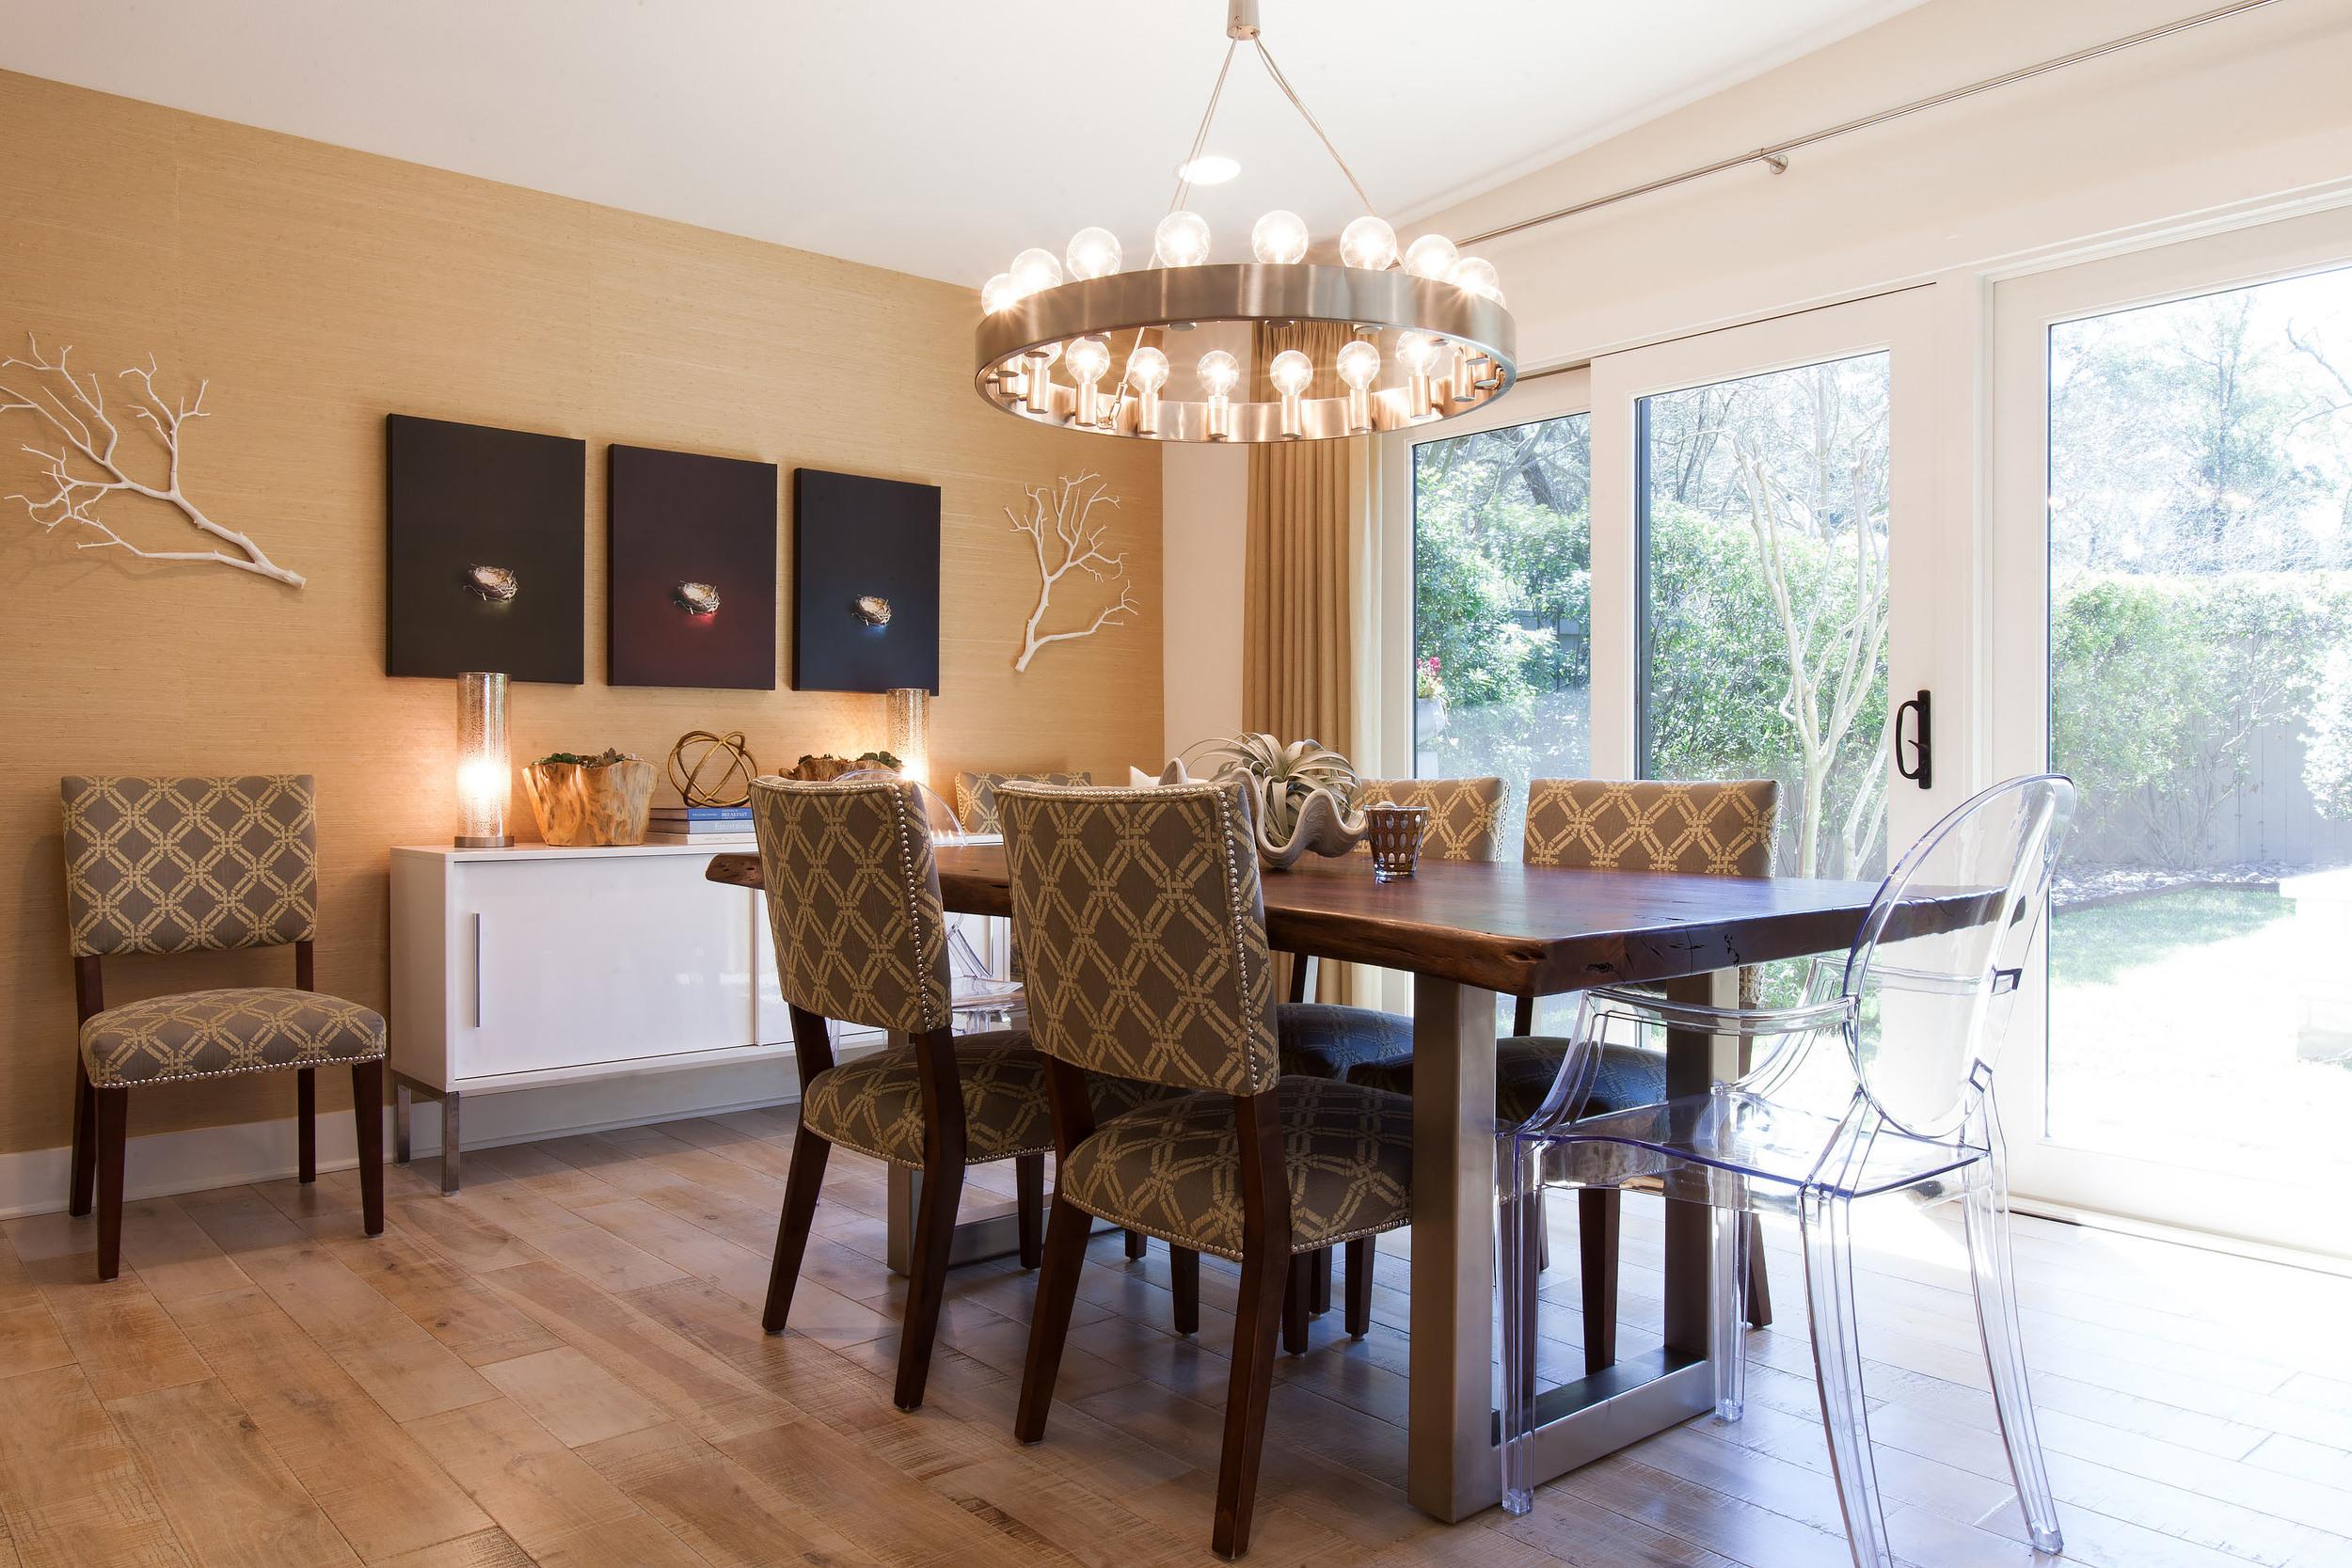 Jamesborough Dining Room